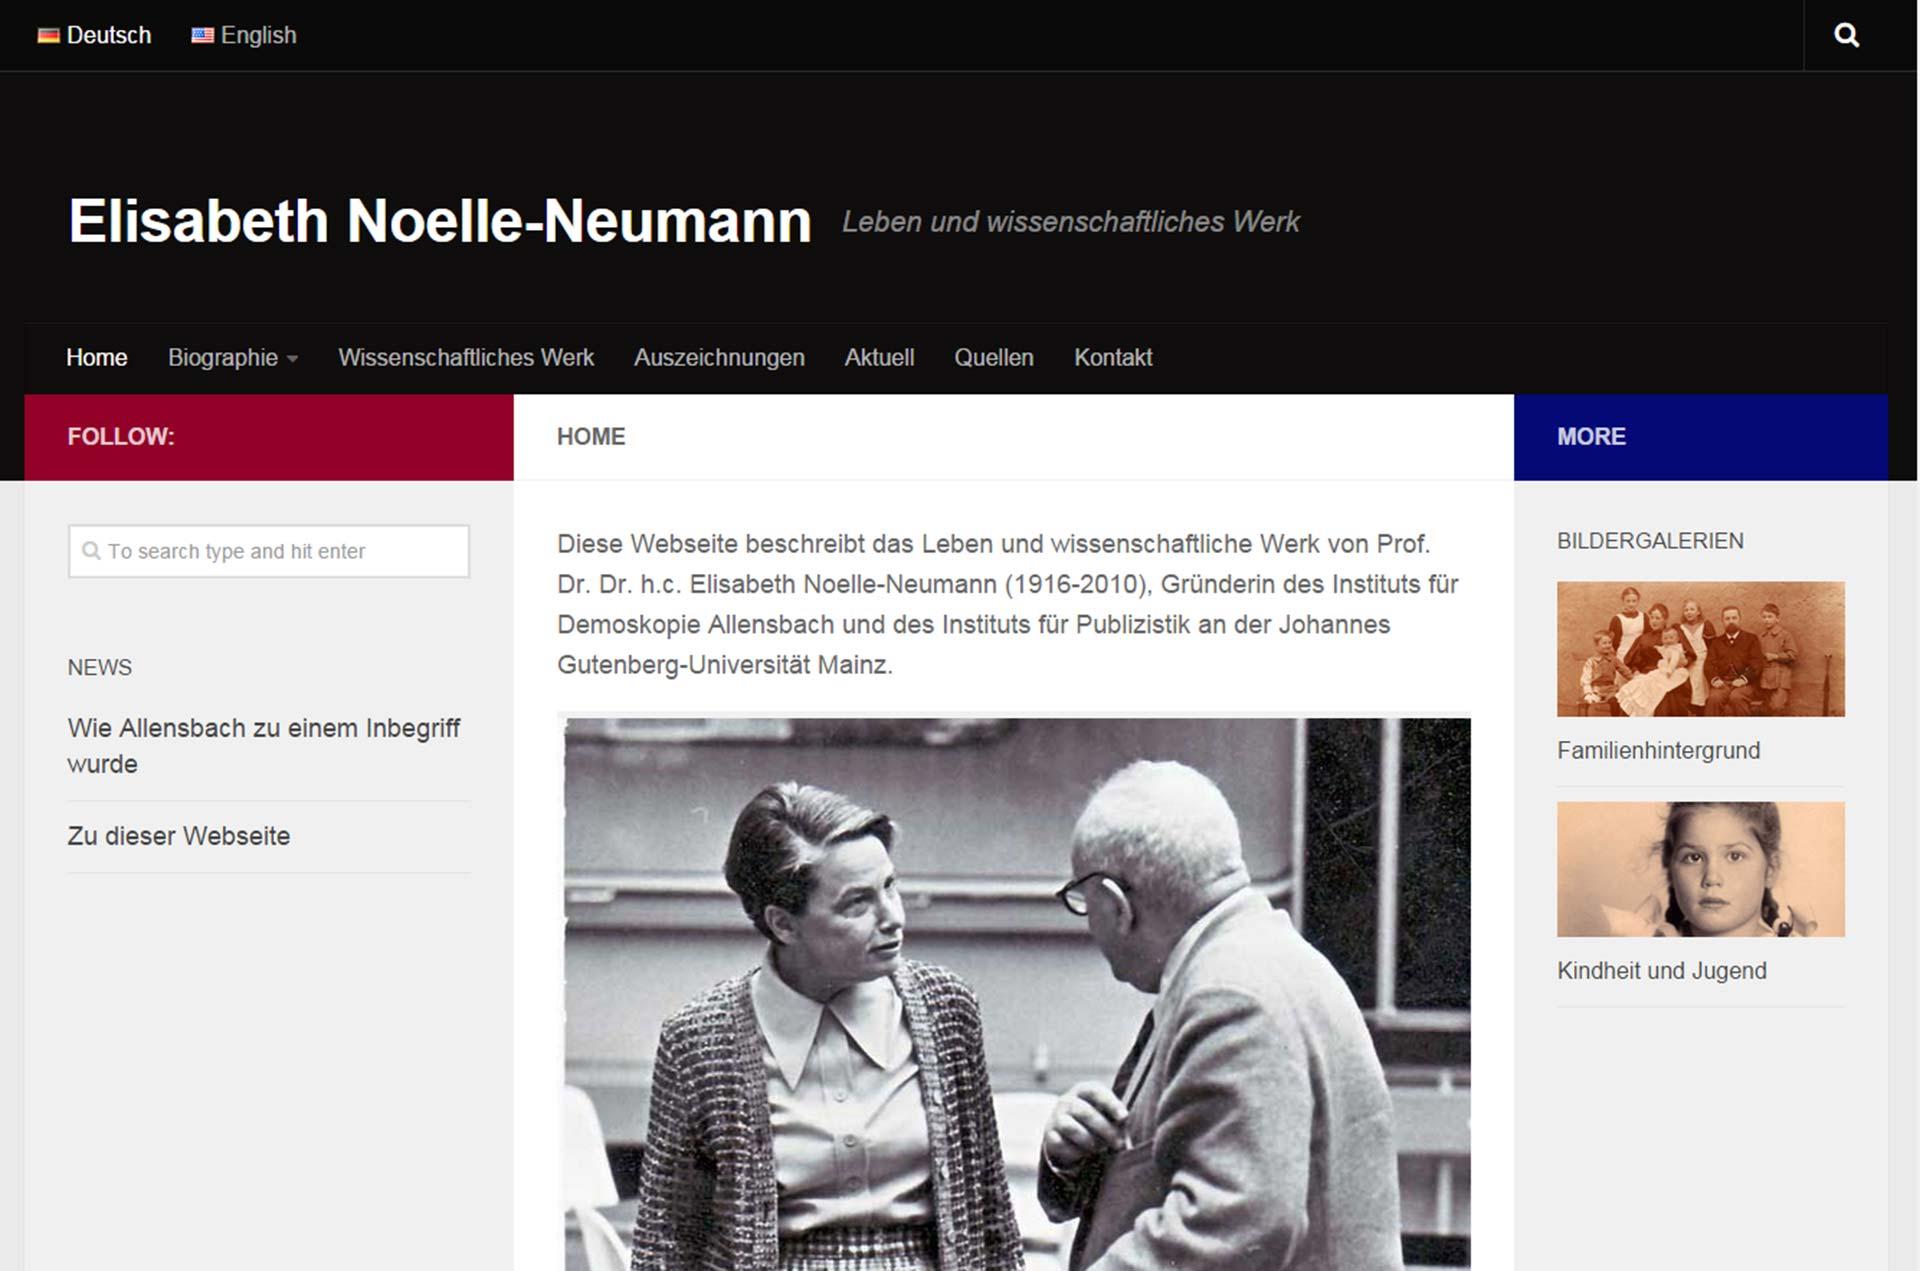 Elisabeth Noelle-Neumann Multilingual Website